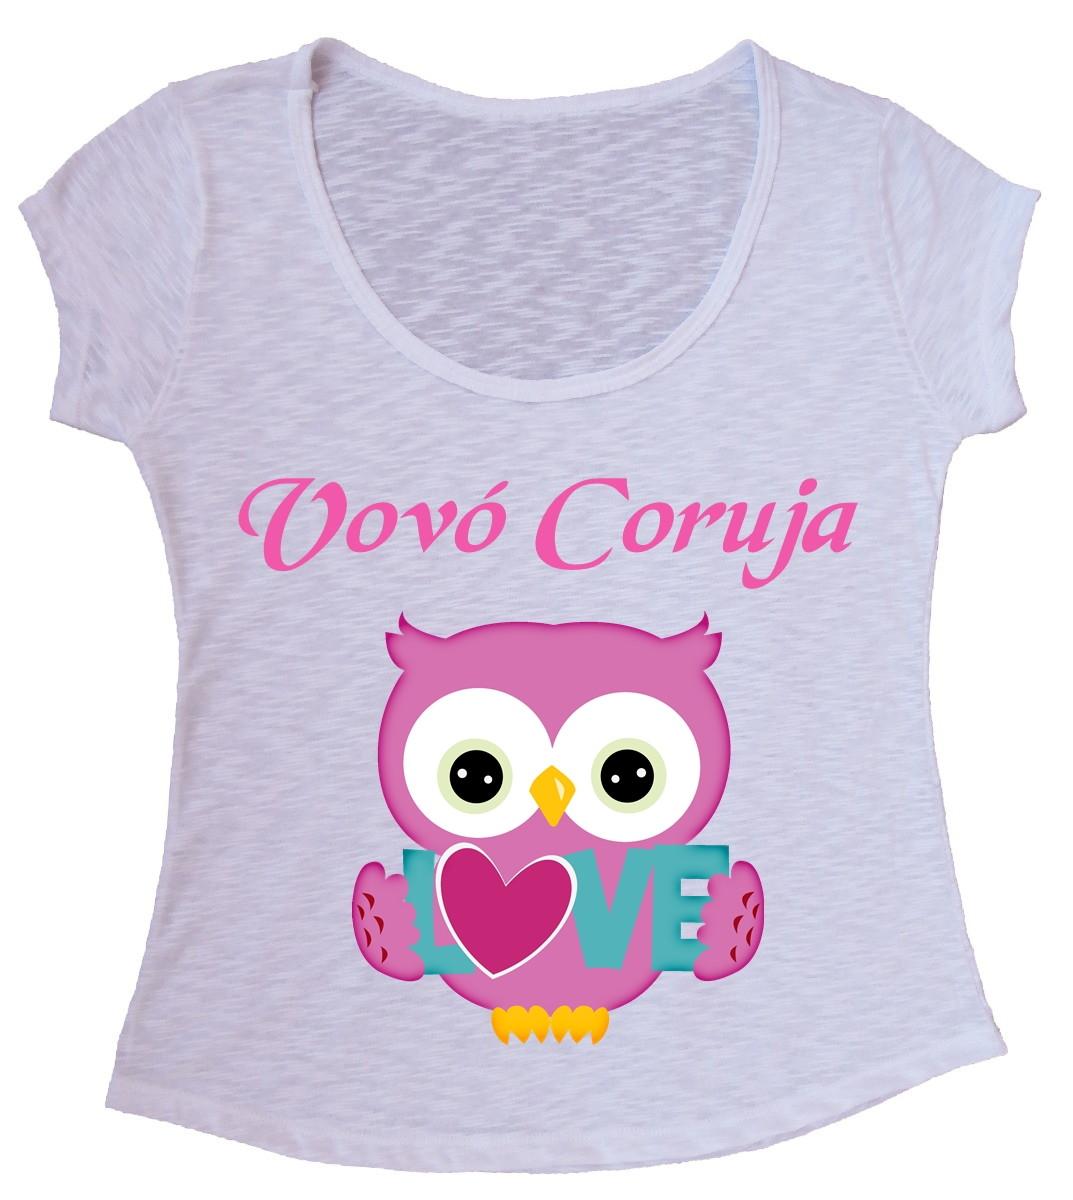 c2176f97e8 Blusa T-shirt Vovó Coruja no Elo7